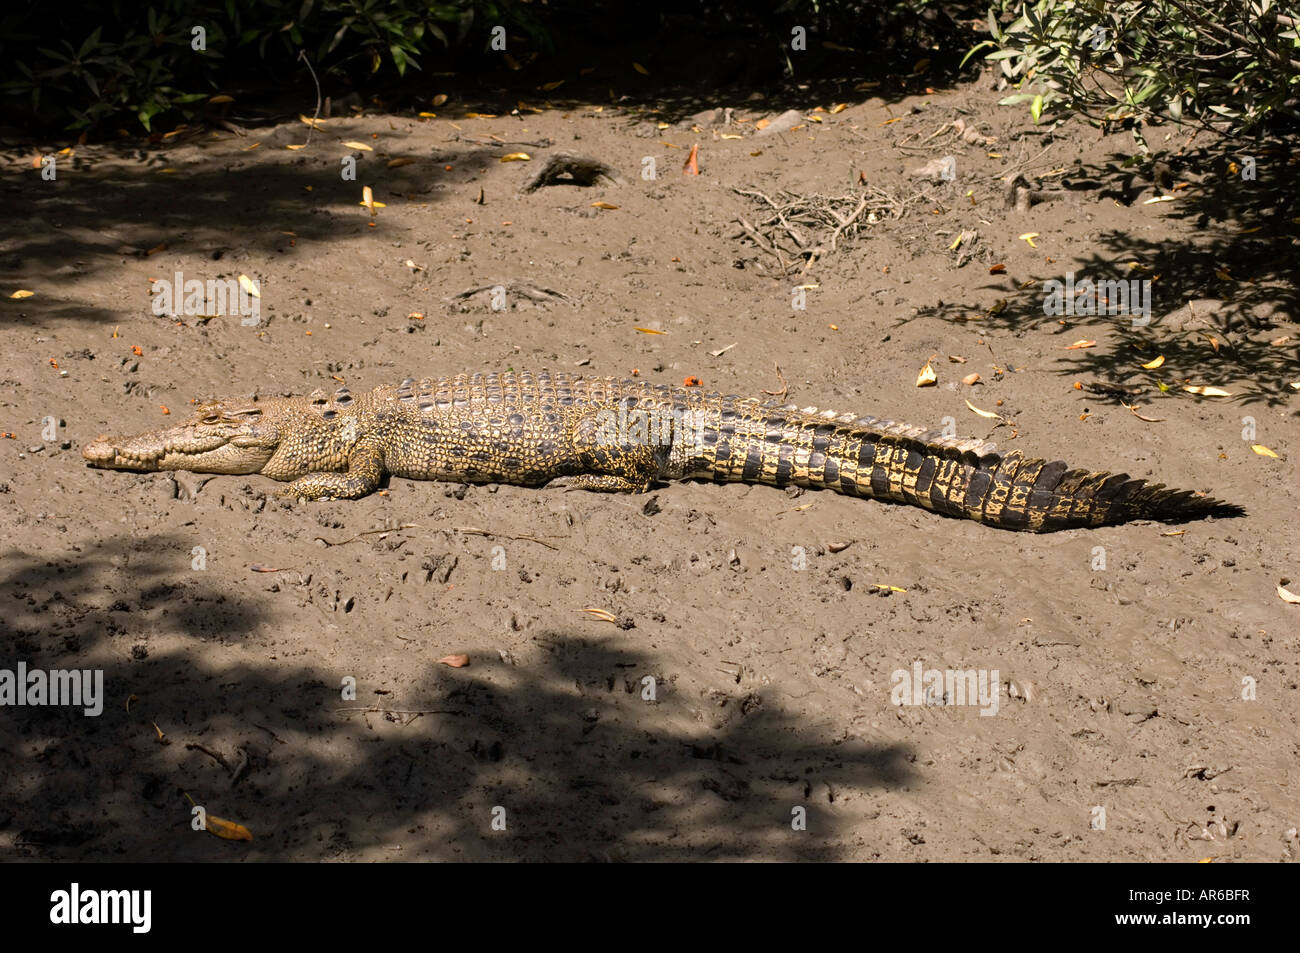 An Australian saltwater or estuarine crocodile sunning itself on a muddy bank - Stock Image